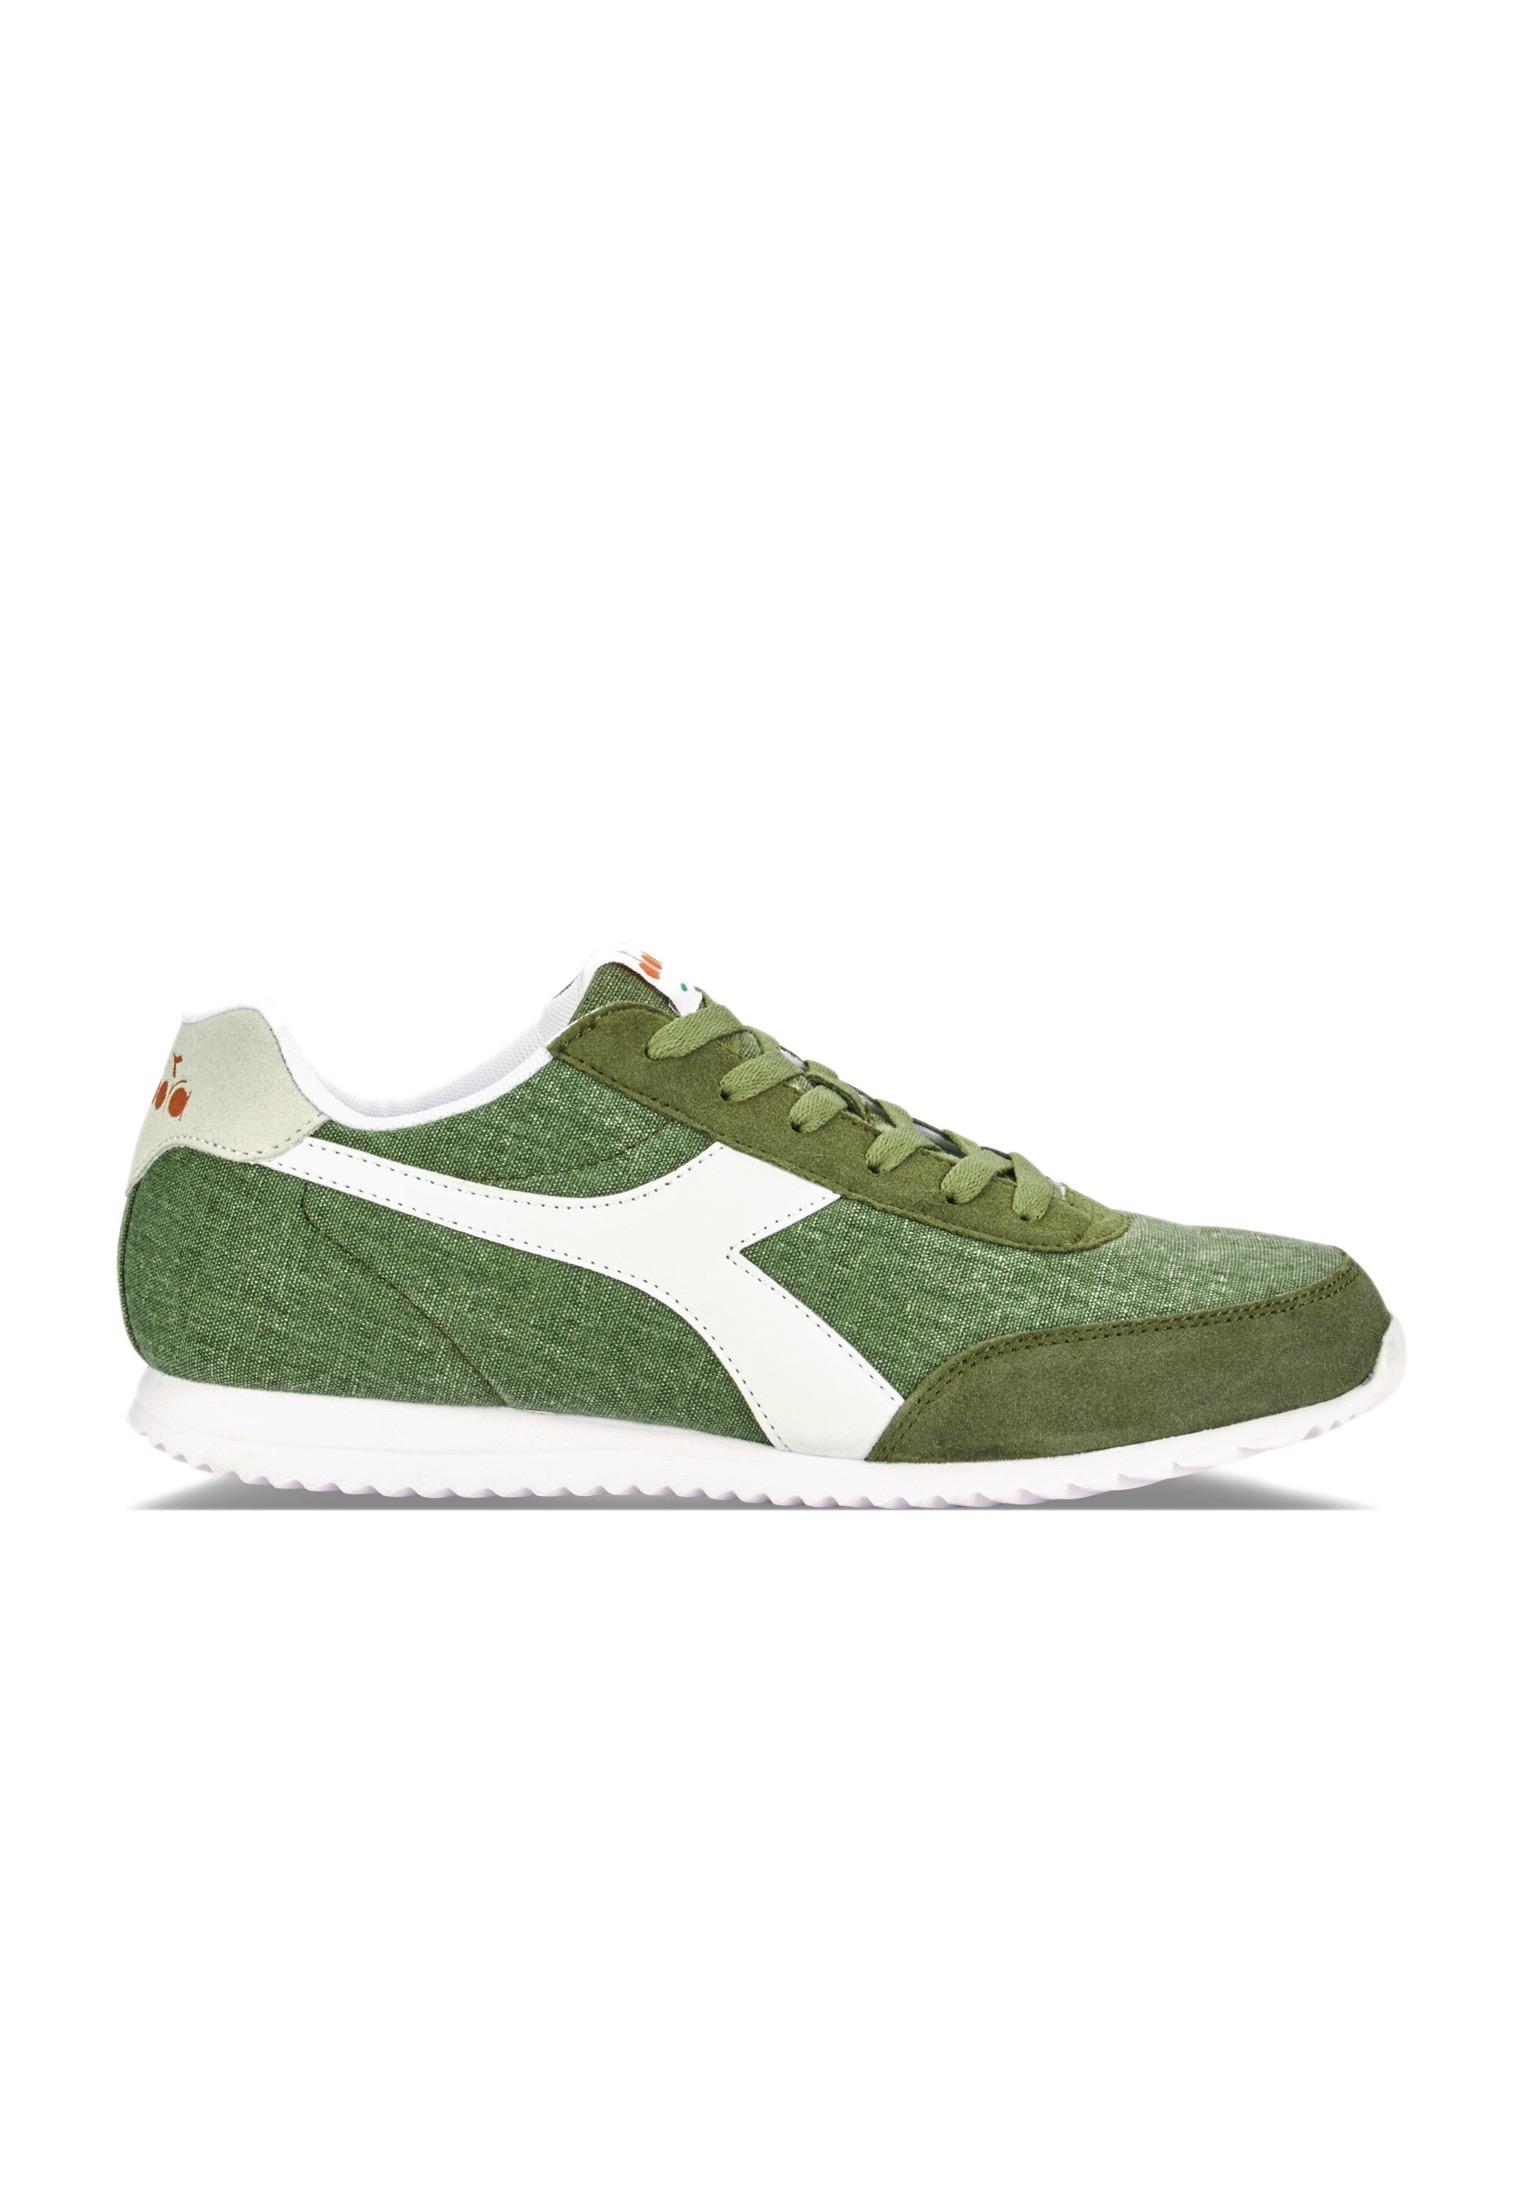 Scarpe-Diadora-Jog-Light-C-Sneakers-sportive-uomo-donna-vari-colori-e-taglie miniatura 49